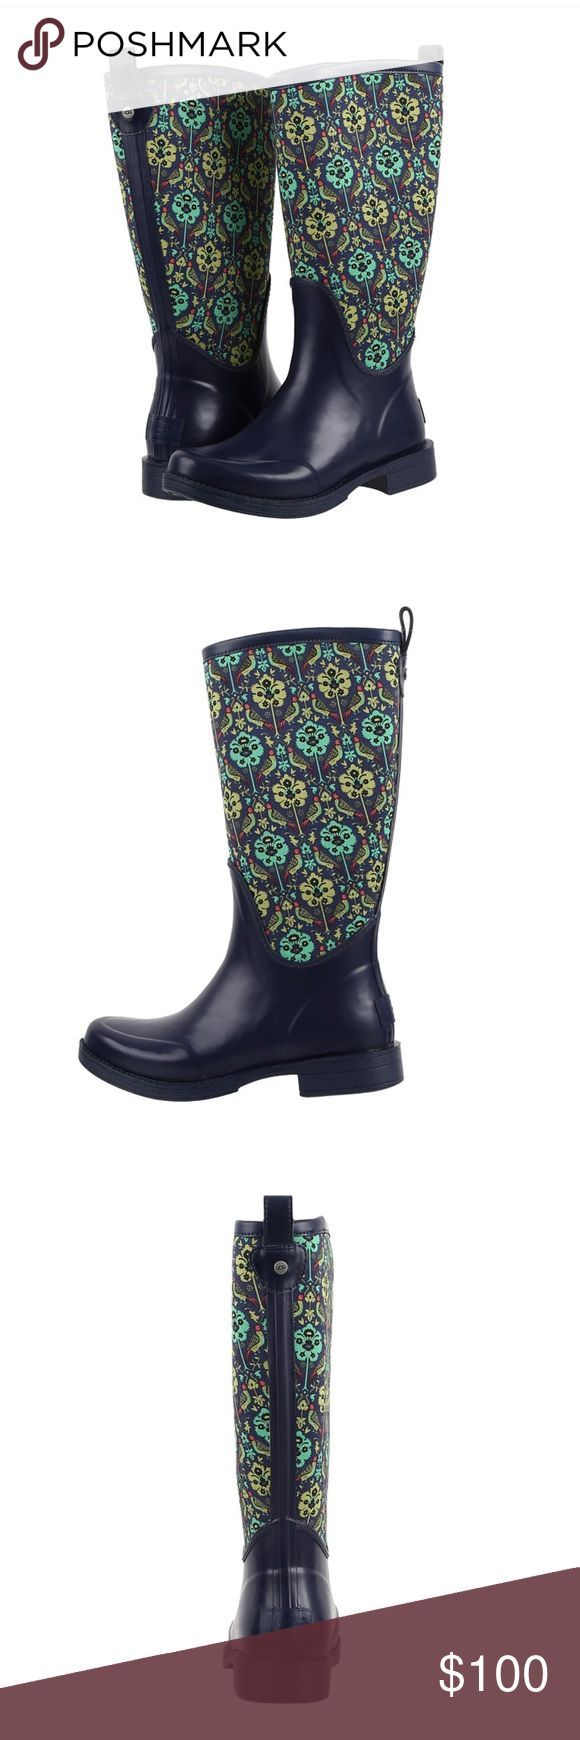 #Boots #NWT #Rain #Rainy Day Outfit for date #Ugg UGG rain boots NWT        ポッシュマークで買い物中に発見:UGGレインブーツ! #poshmark #ファッション #ショッピング #スタイル #UGG #靴 #rainydayoutfitforwork